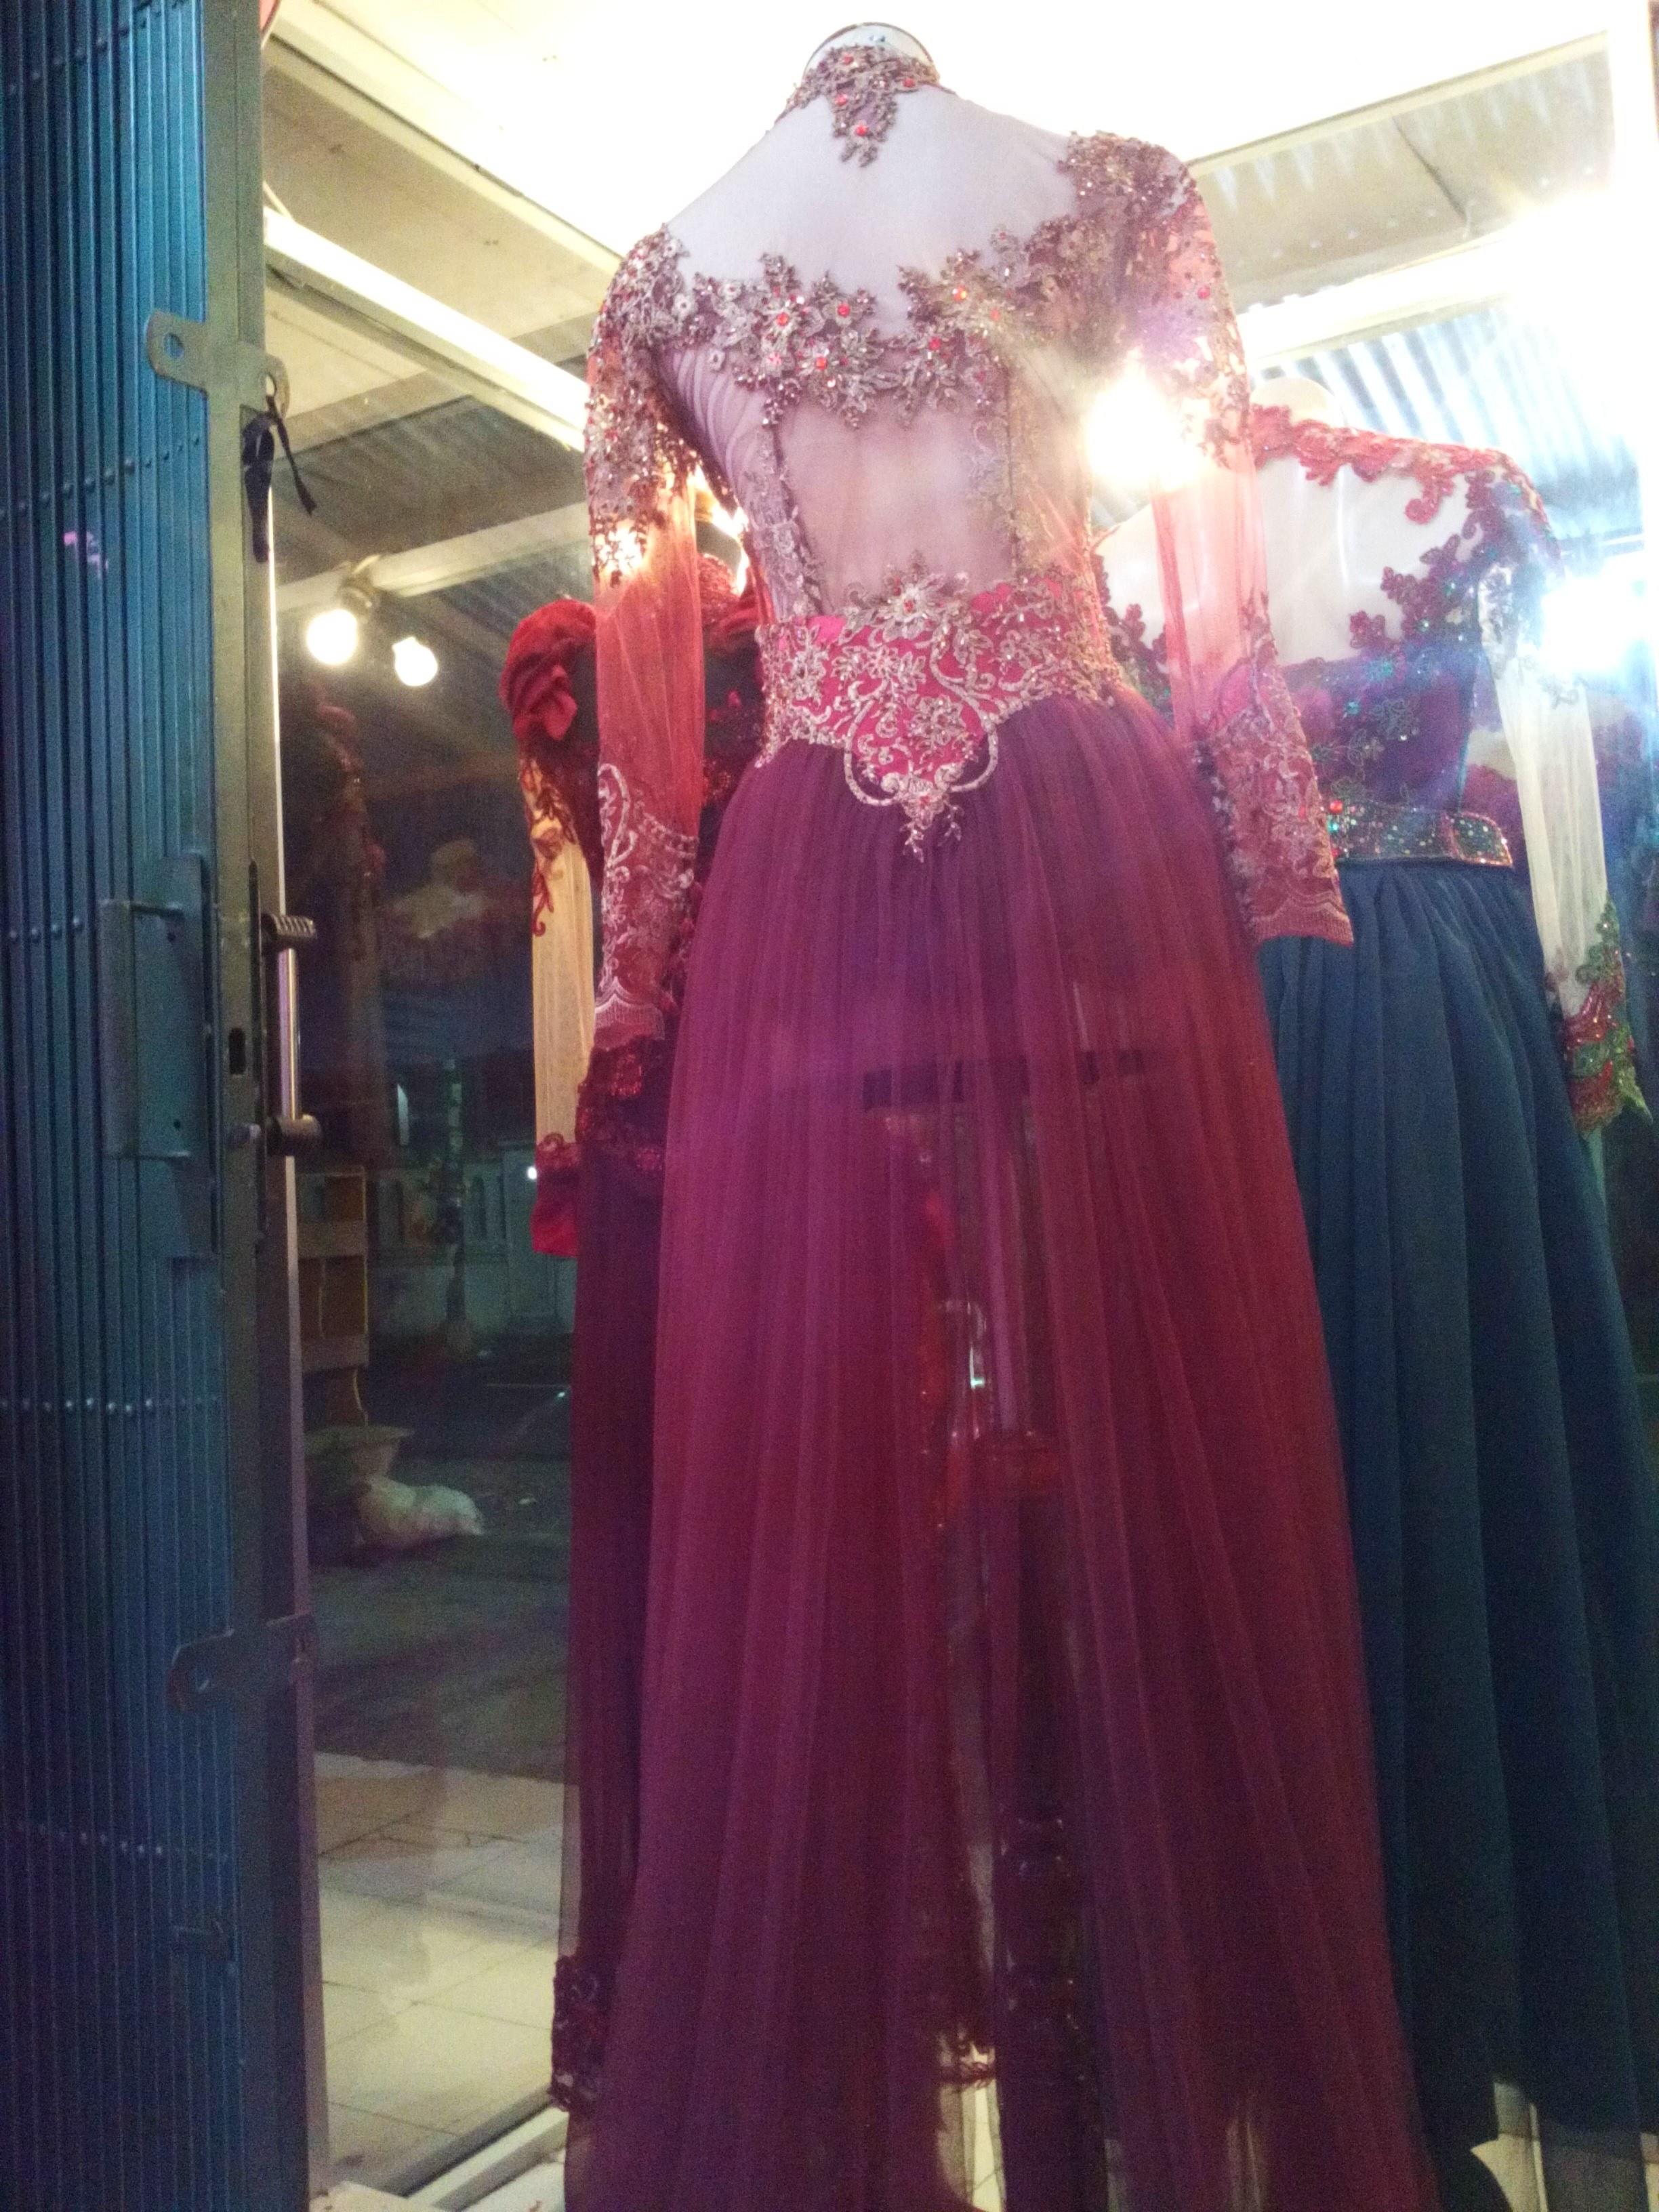 Bentuk Gaun Pengantin Muslimah Warna Merah Marun 3ldq Kebaya Pengantin Ekor Panjang Warna Merah Maroon